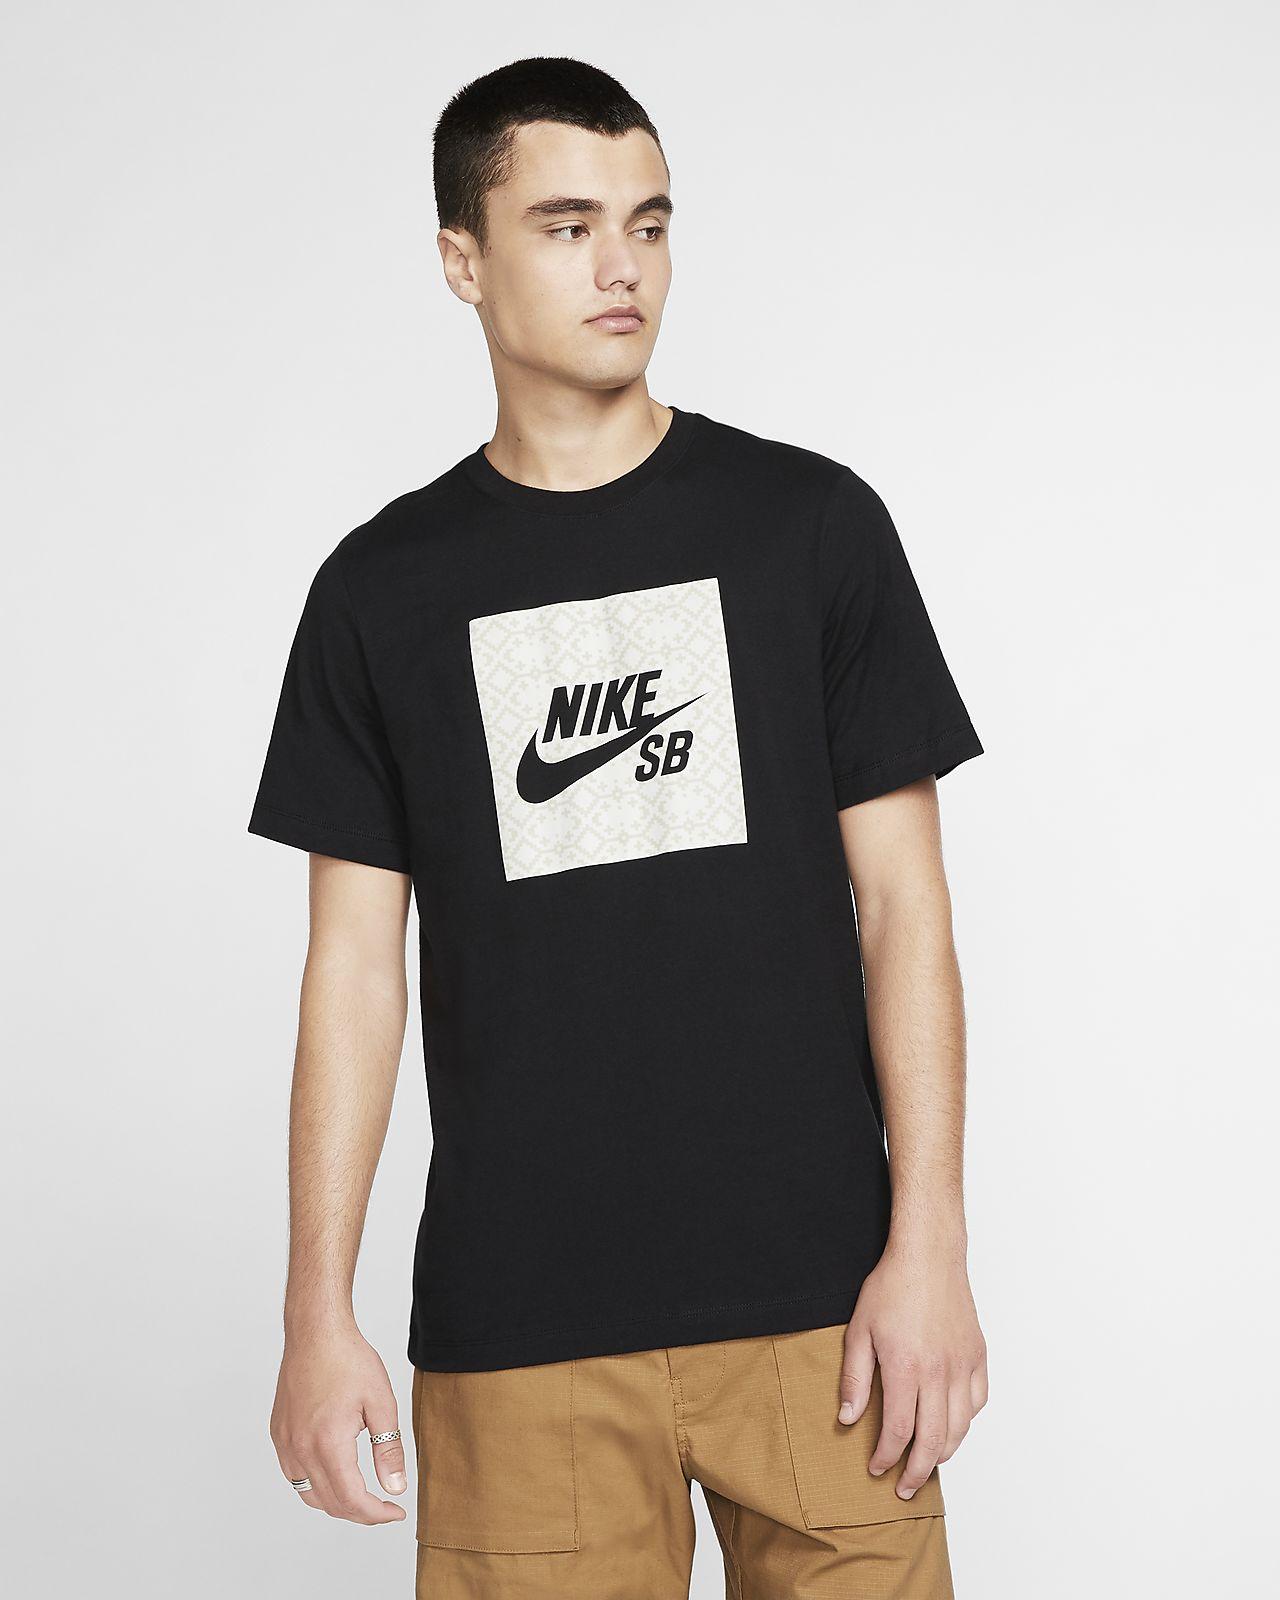 nike t shirt sb